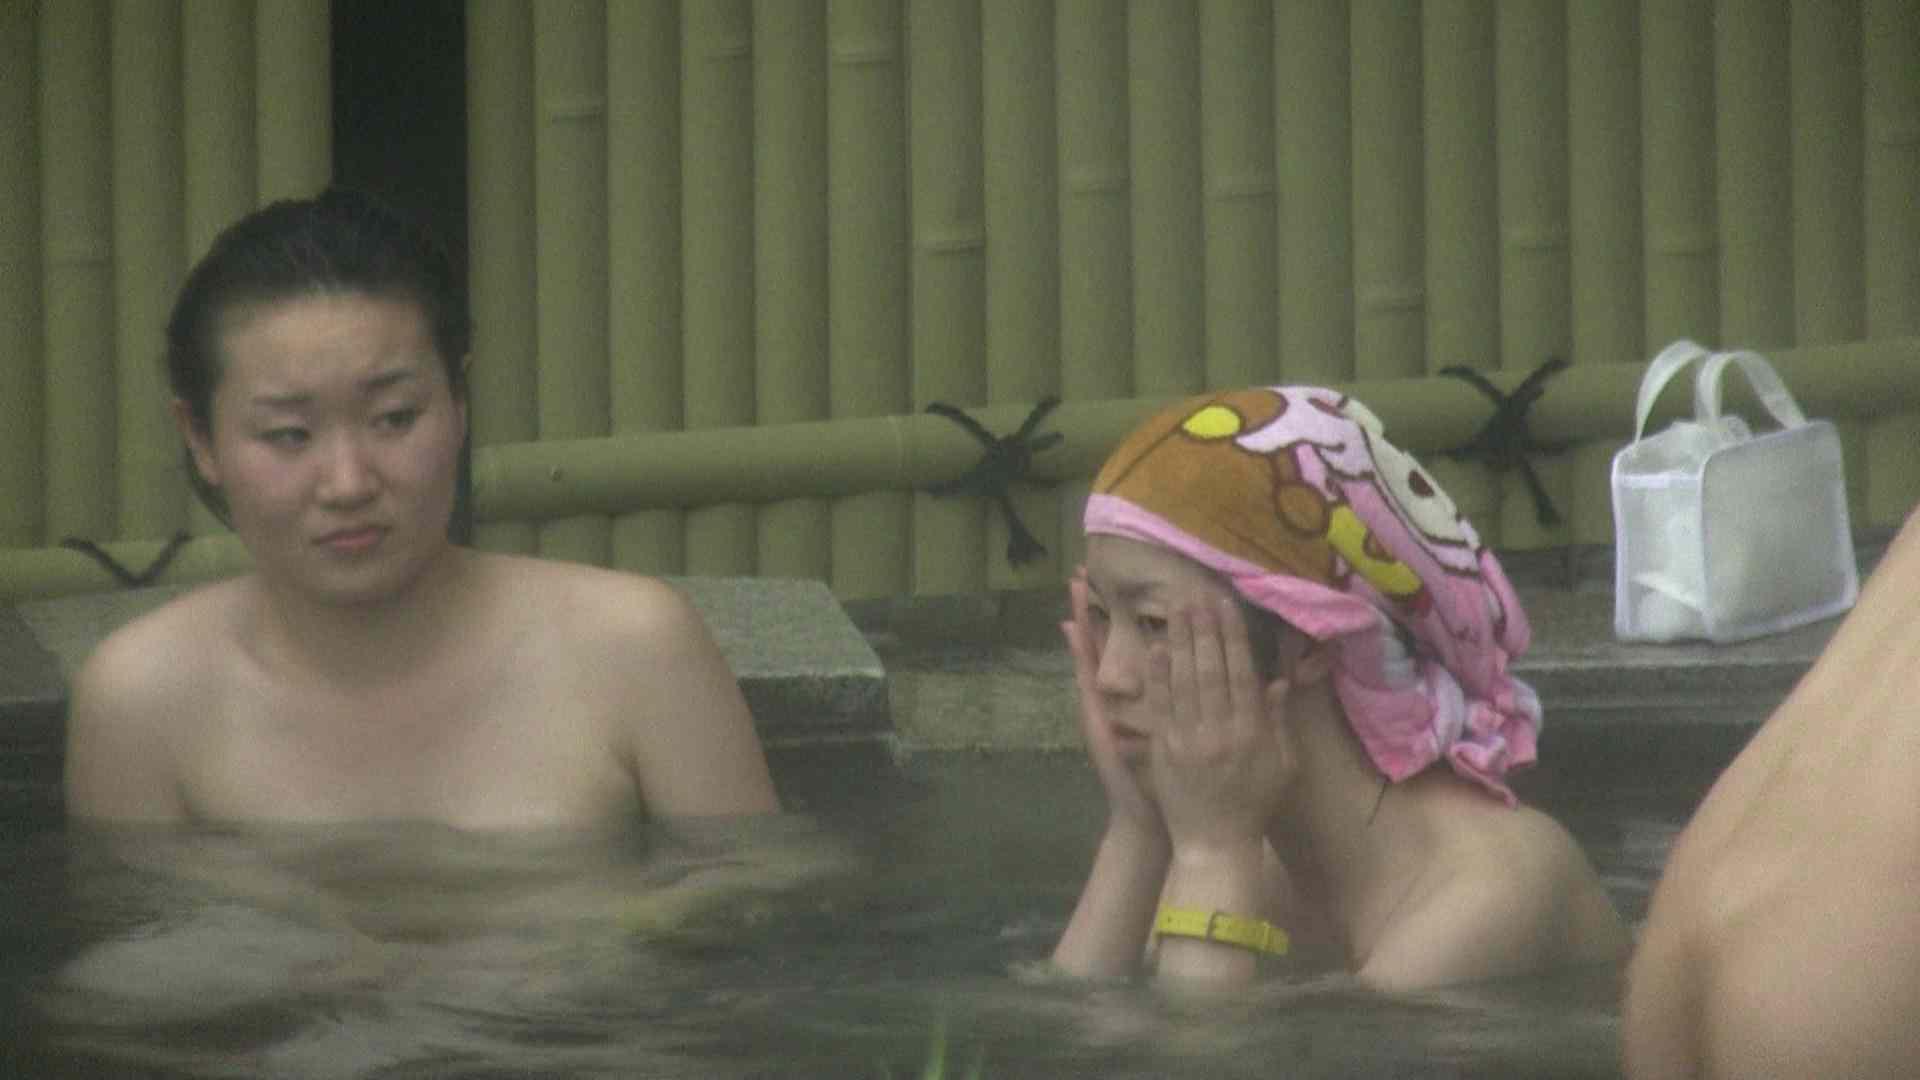 Aquaな露天風呂Vol.171 OLエロ画像 盗撮戯れ無修正画像 108PICs 68